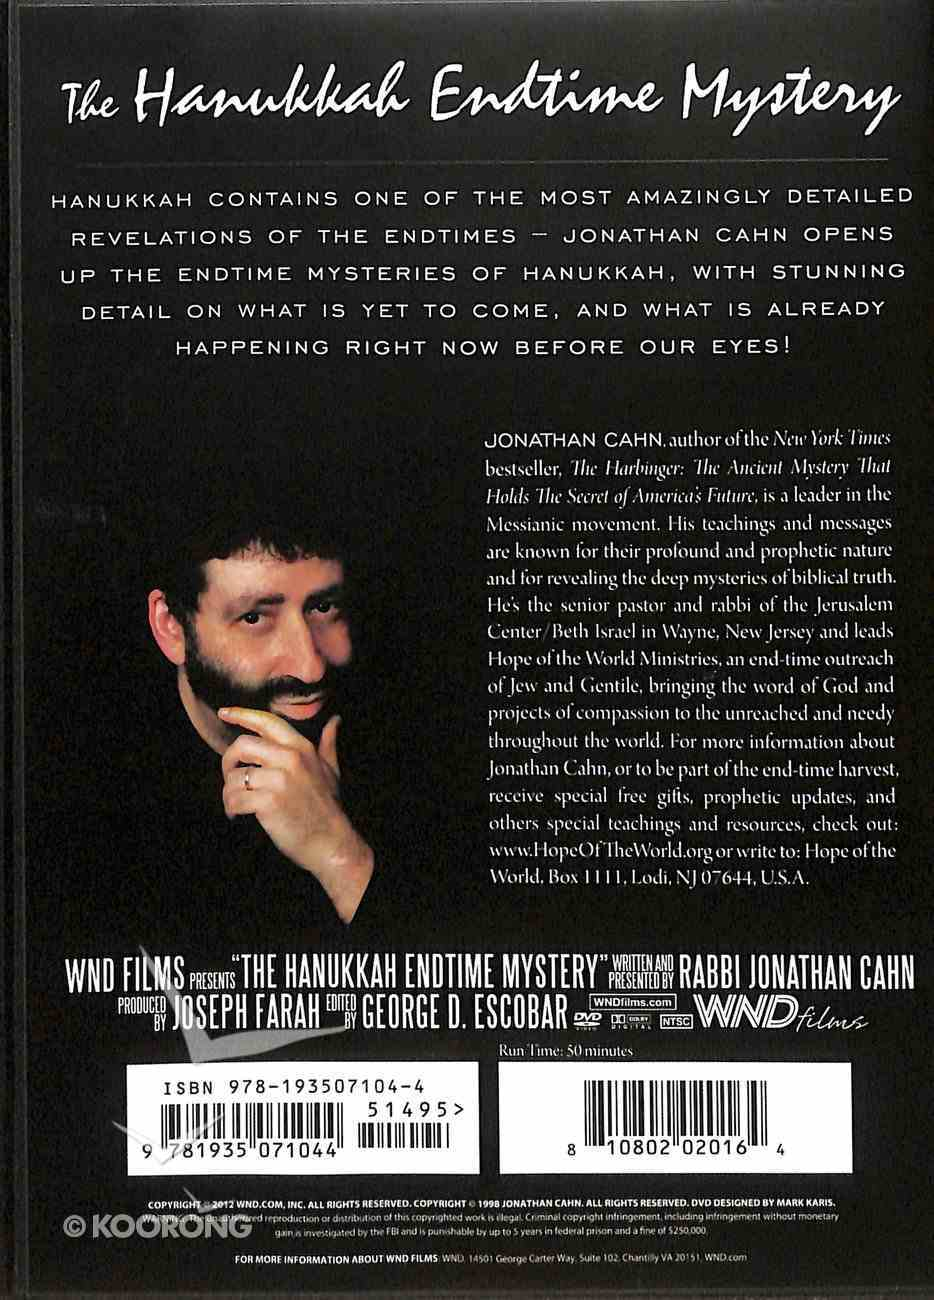 The Hanukkah Endtime Mysteries DVD